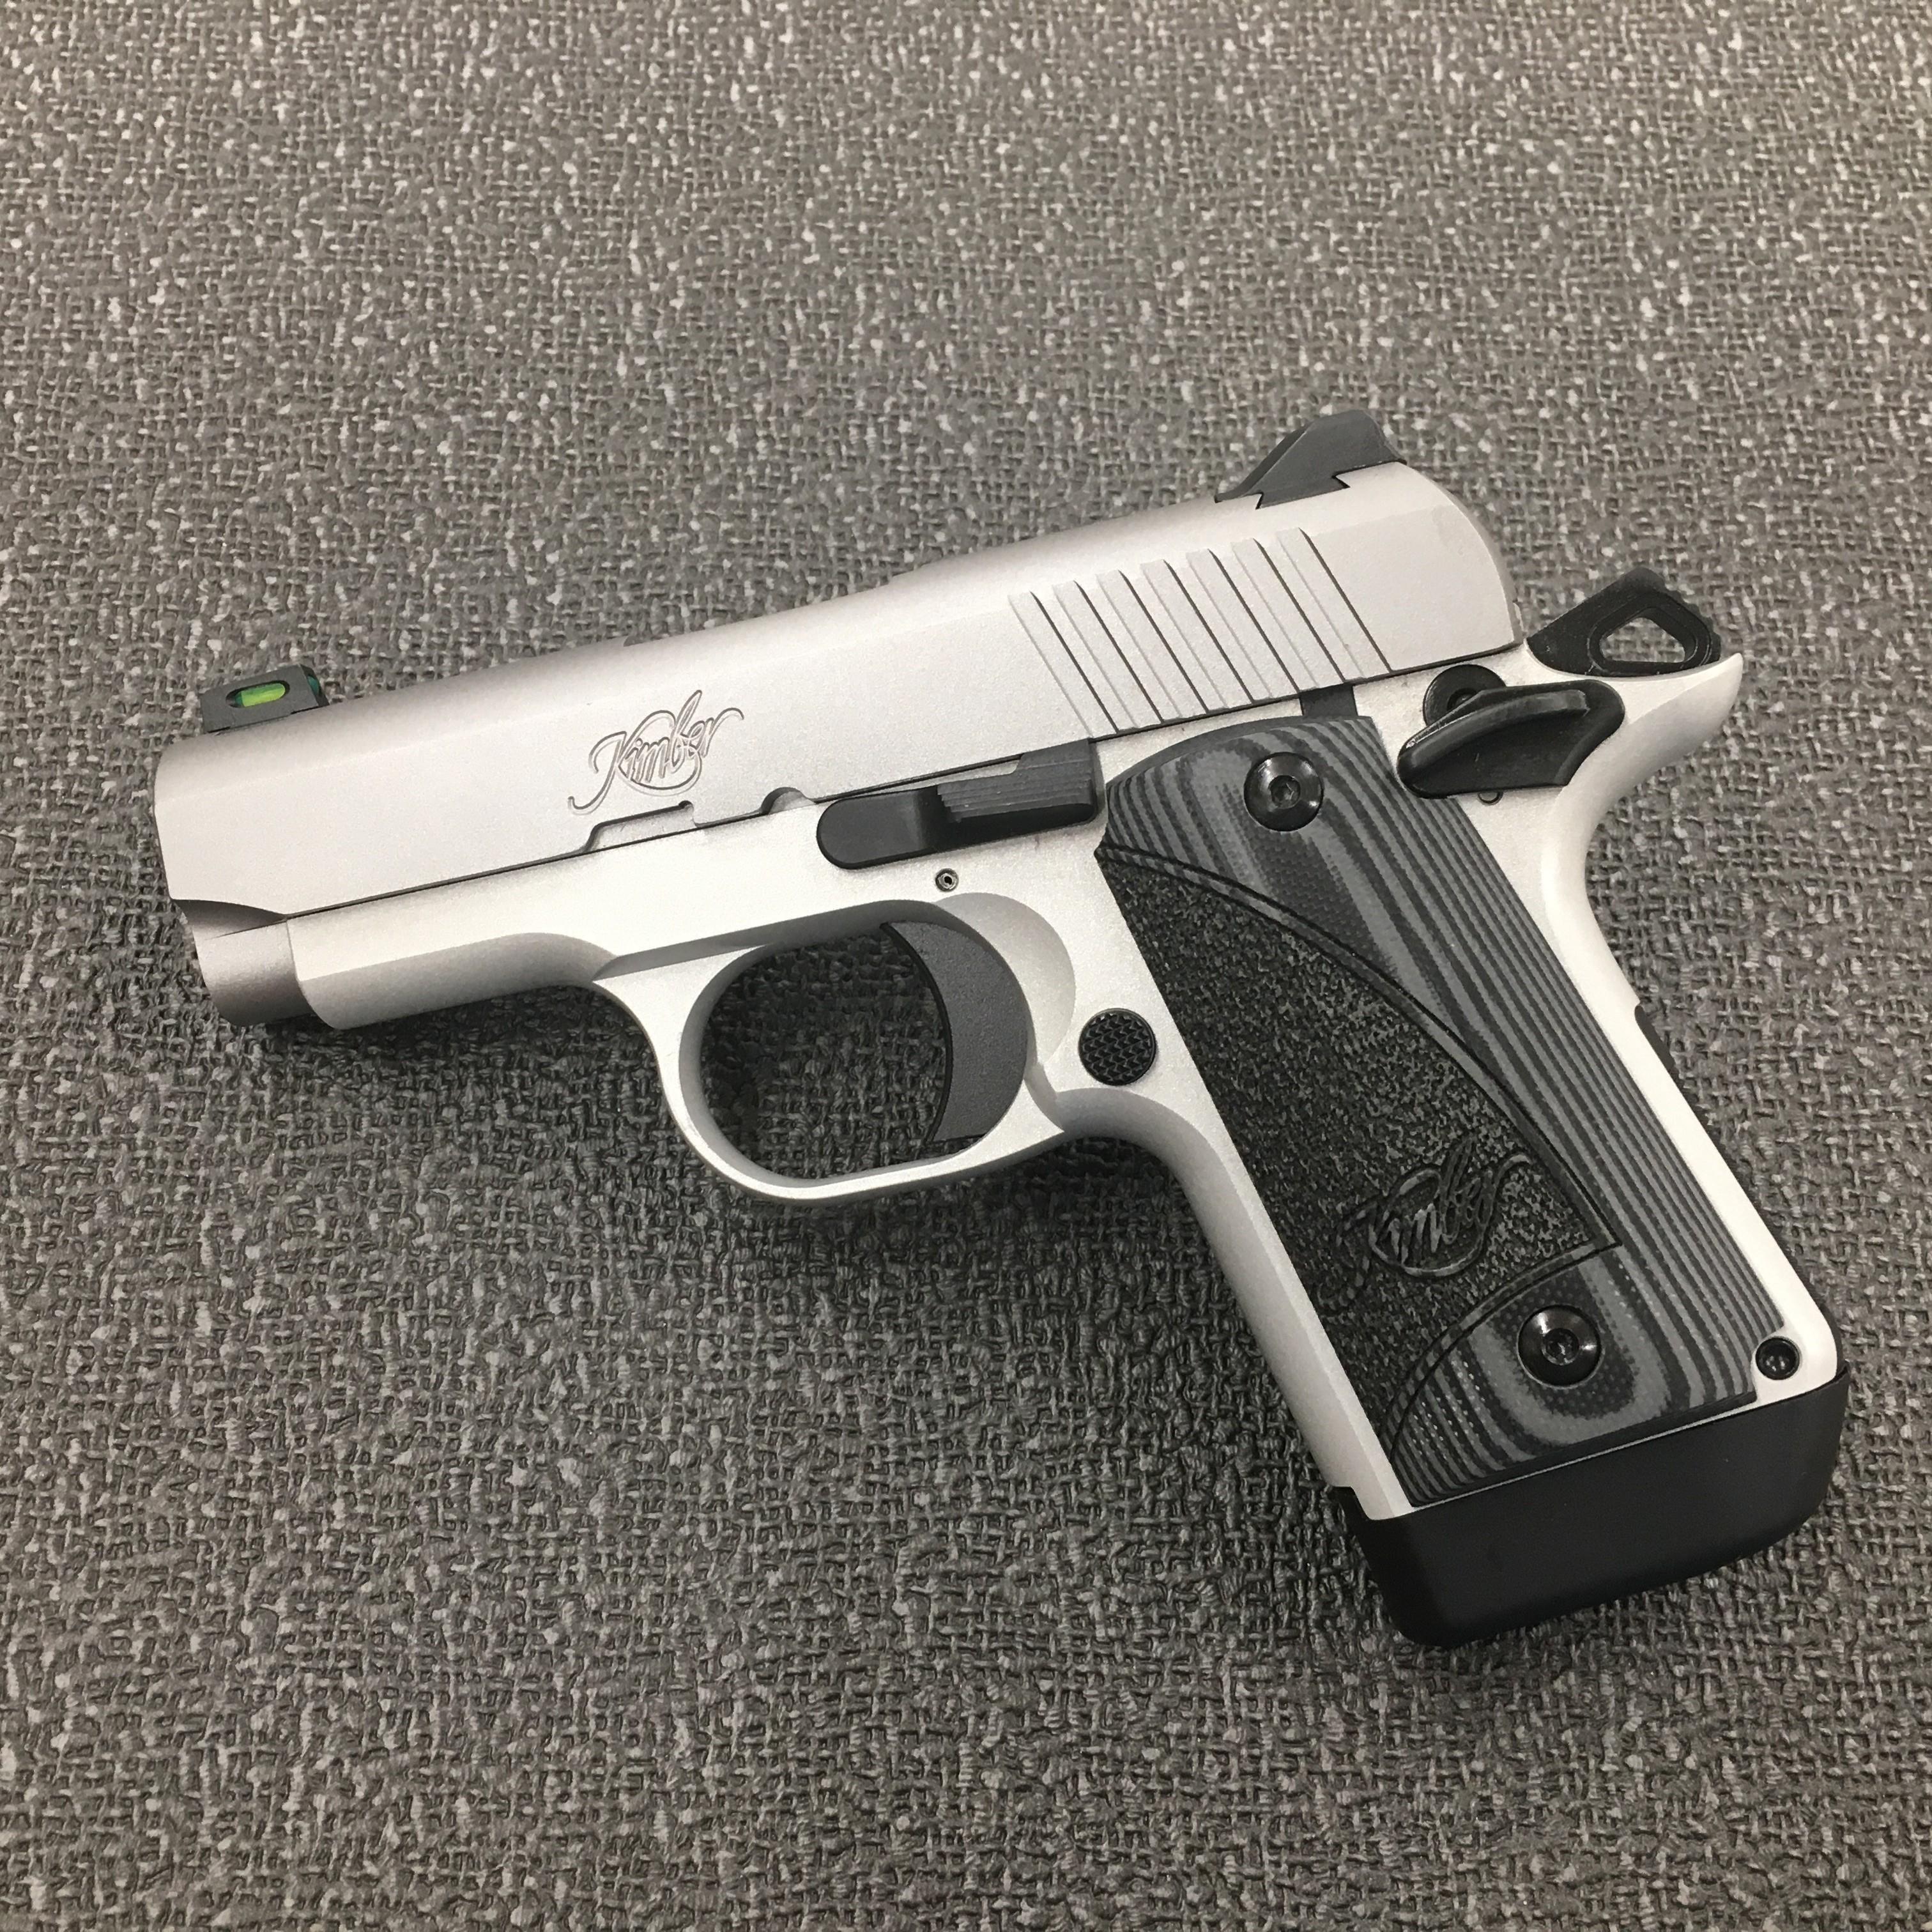 Kimber 1911 Micro Pistols: Kimber Micro 9 Fiber Optic Stainless Steel 9mm Pistol Gray